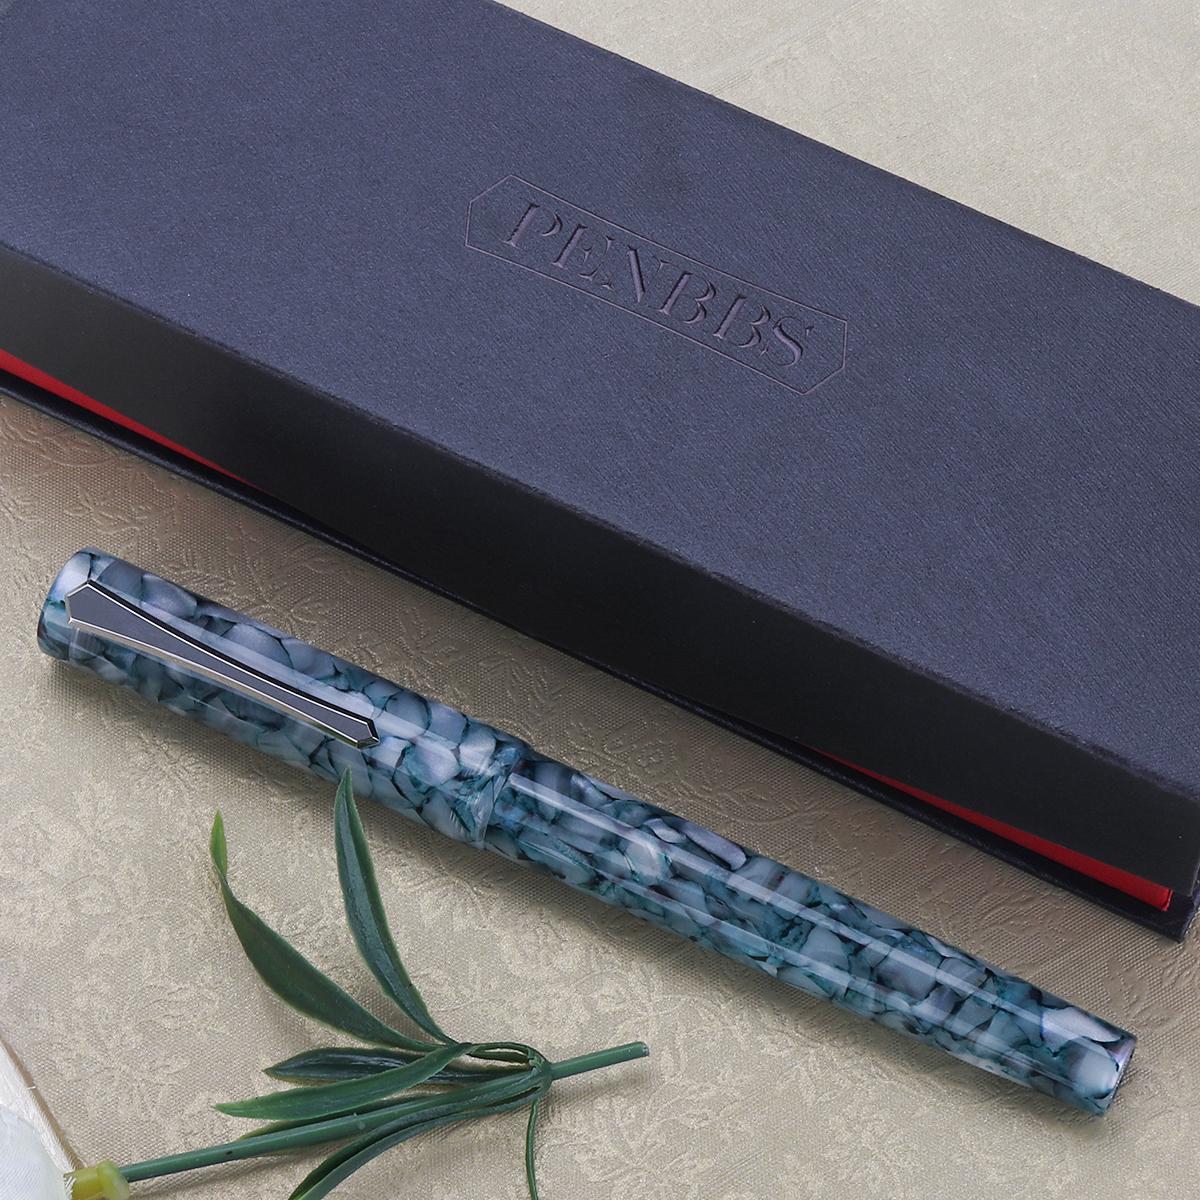 1 pcs Magnetic Piston Ink Absorption Pen EF F Nib 0.5mm Resin Fine Fountain Pen Business Writing Ink Pen